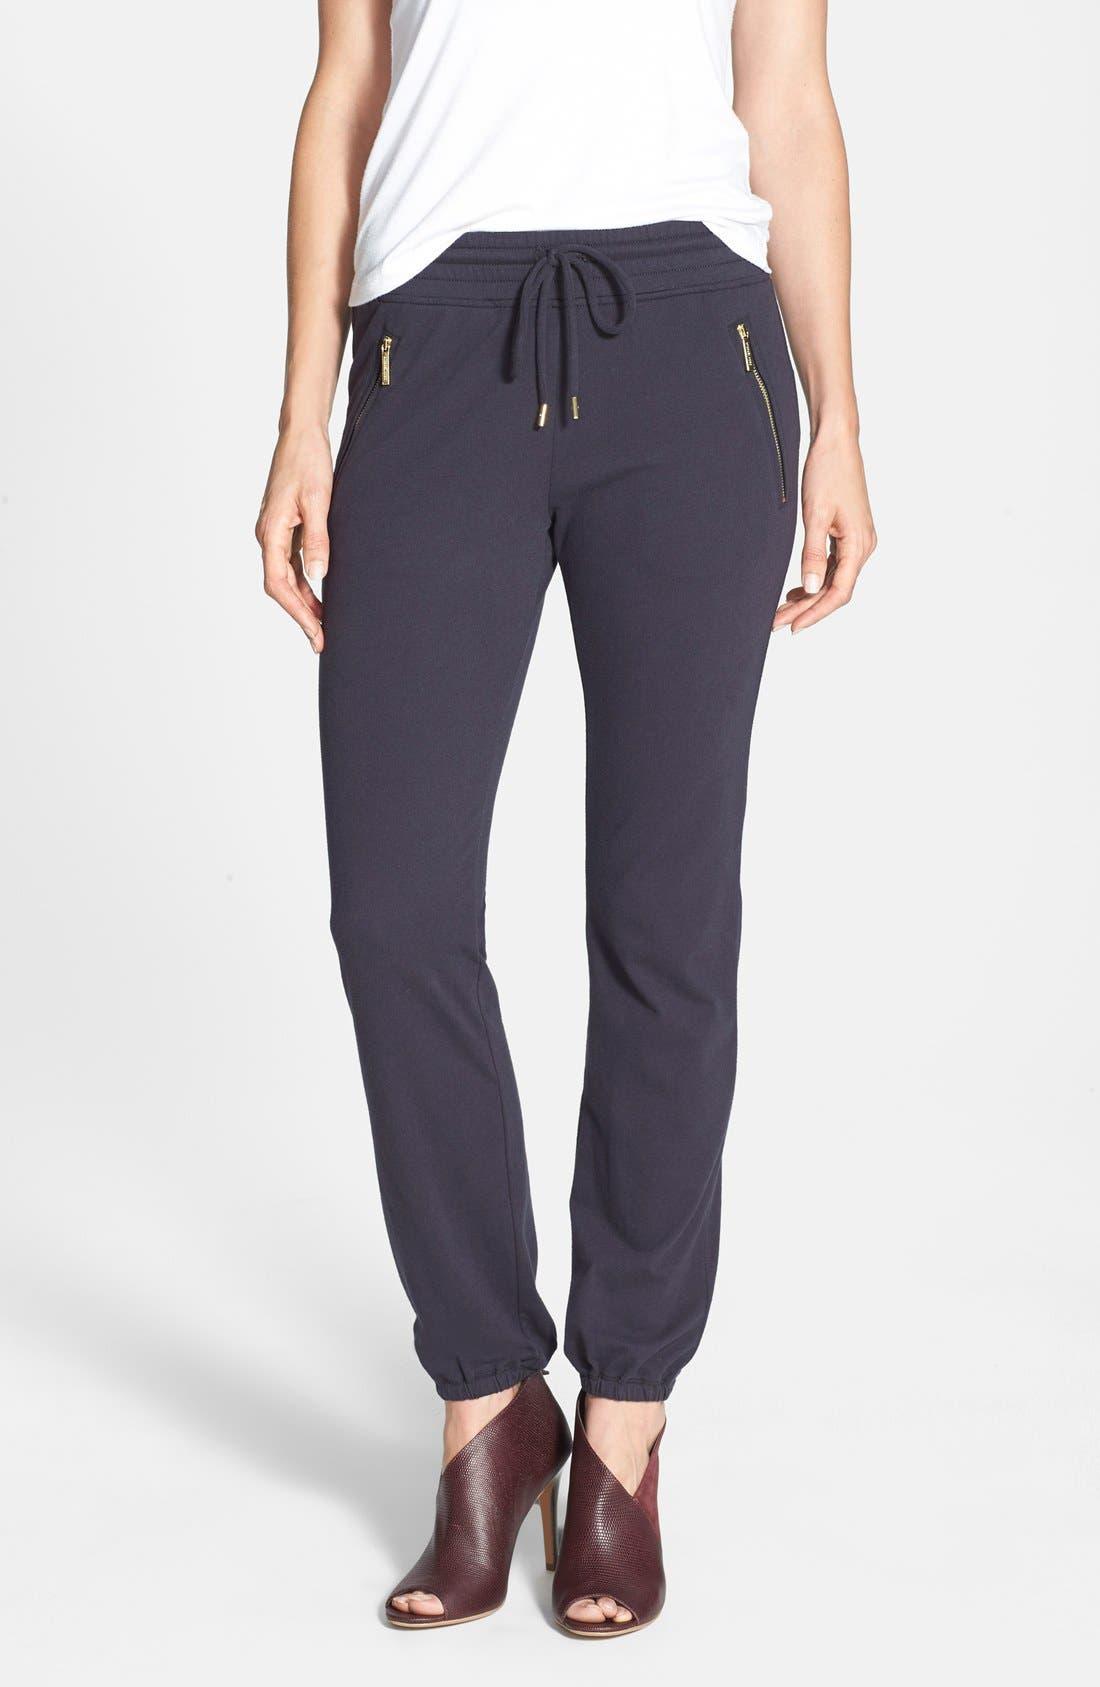 Alternate Image 1 Selected - MICHAEL Michael Kors Zip Pocket Knit Track Pants (Regular & Petite)